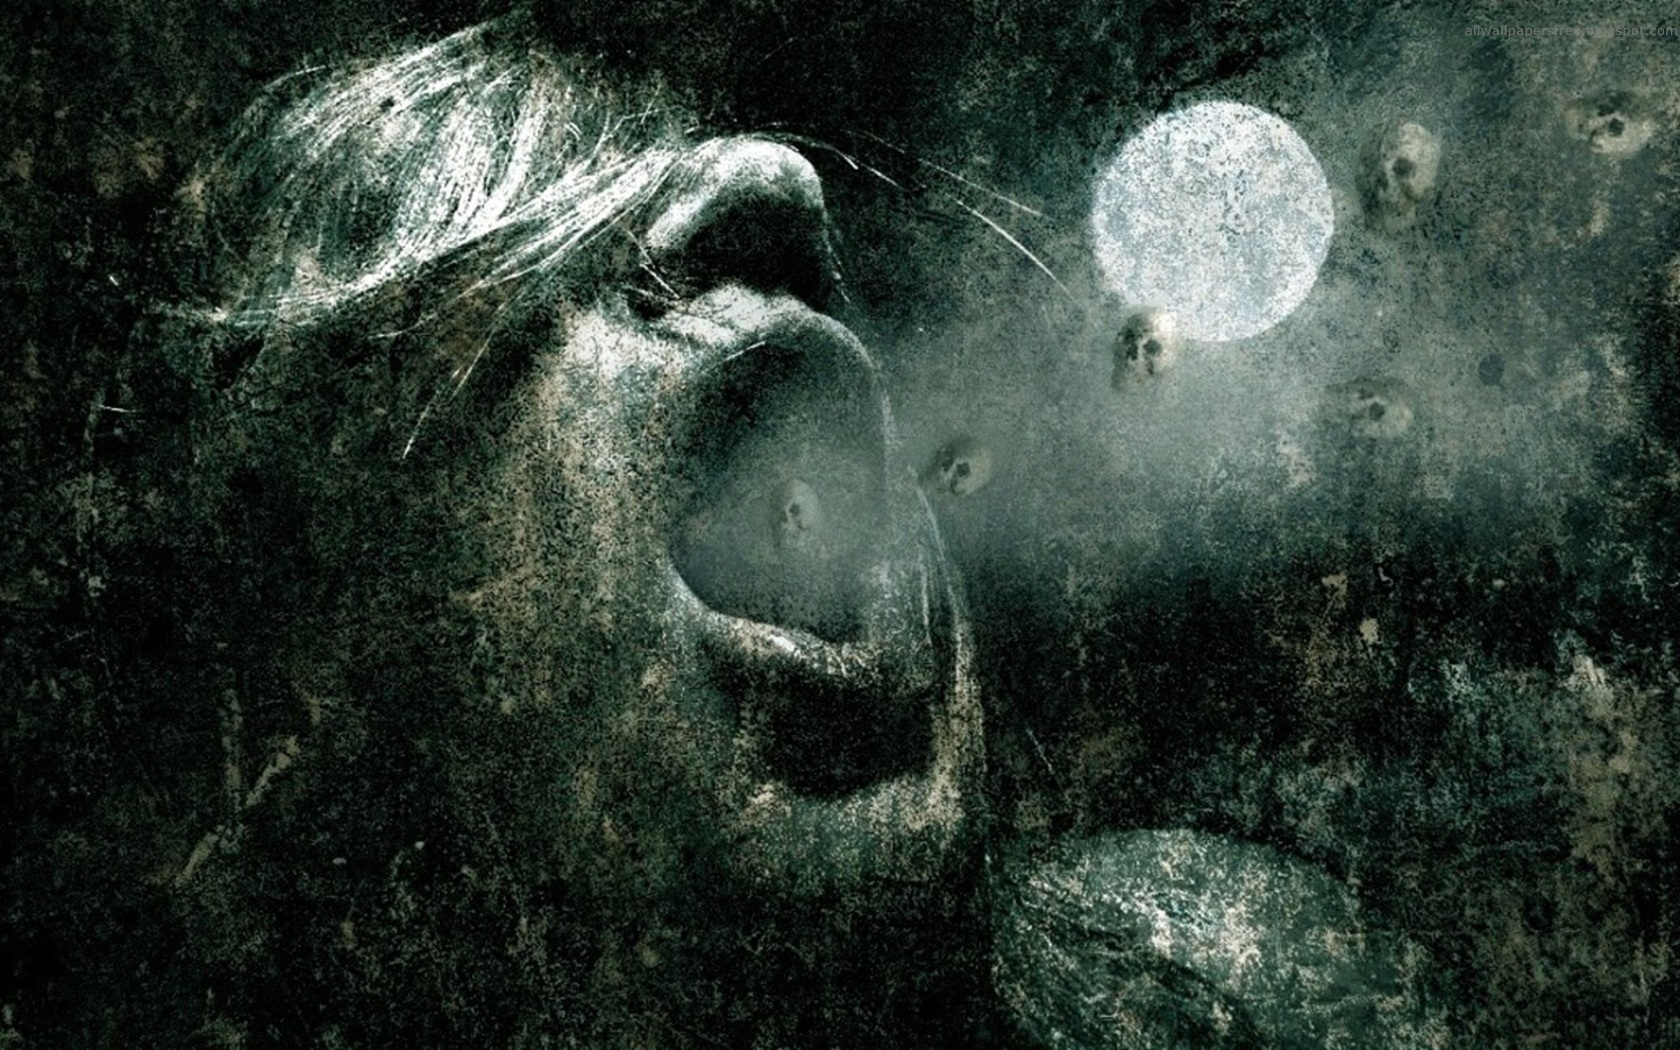 Creepy wallpaper and background image 1680x1050 id 204509 - Dark horror creepy wallpapers ...